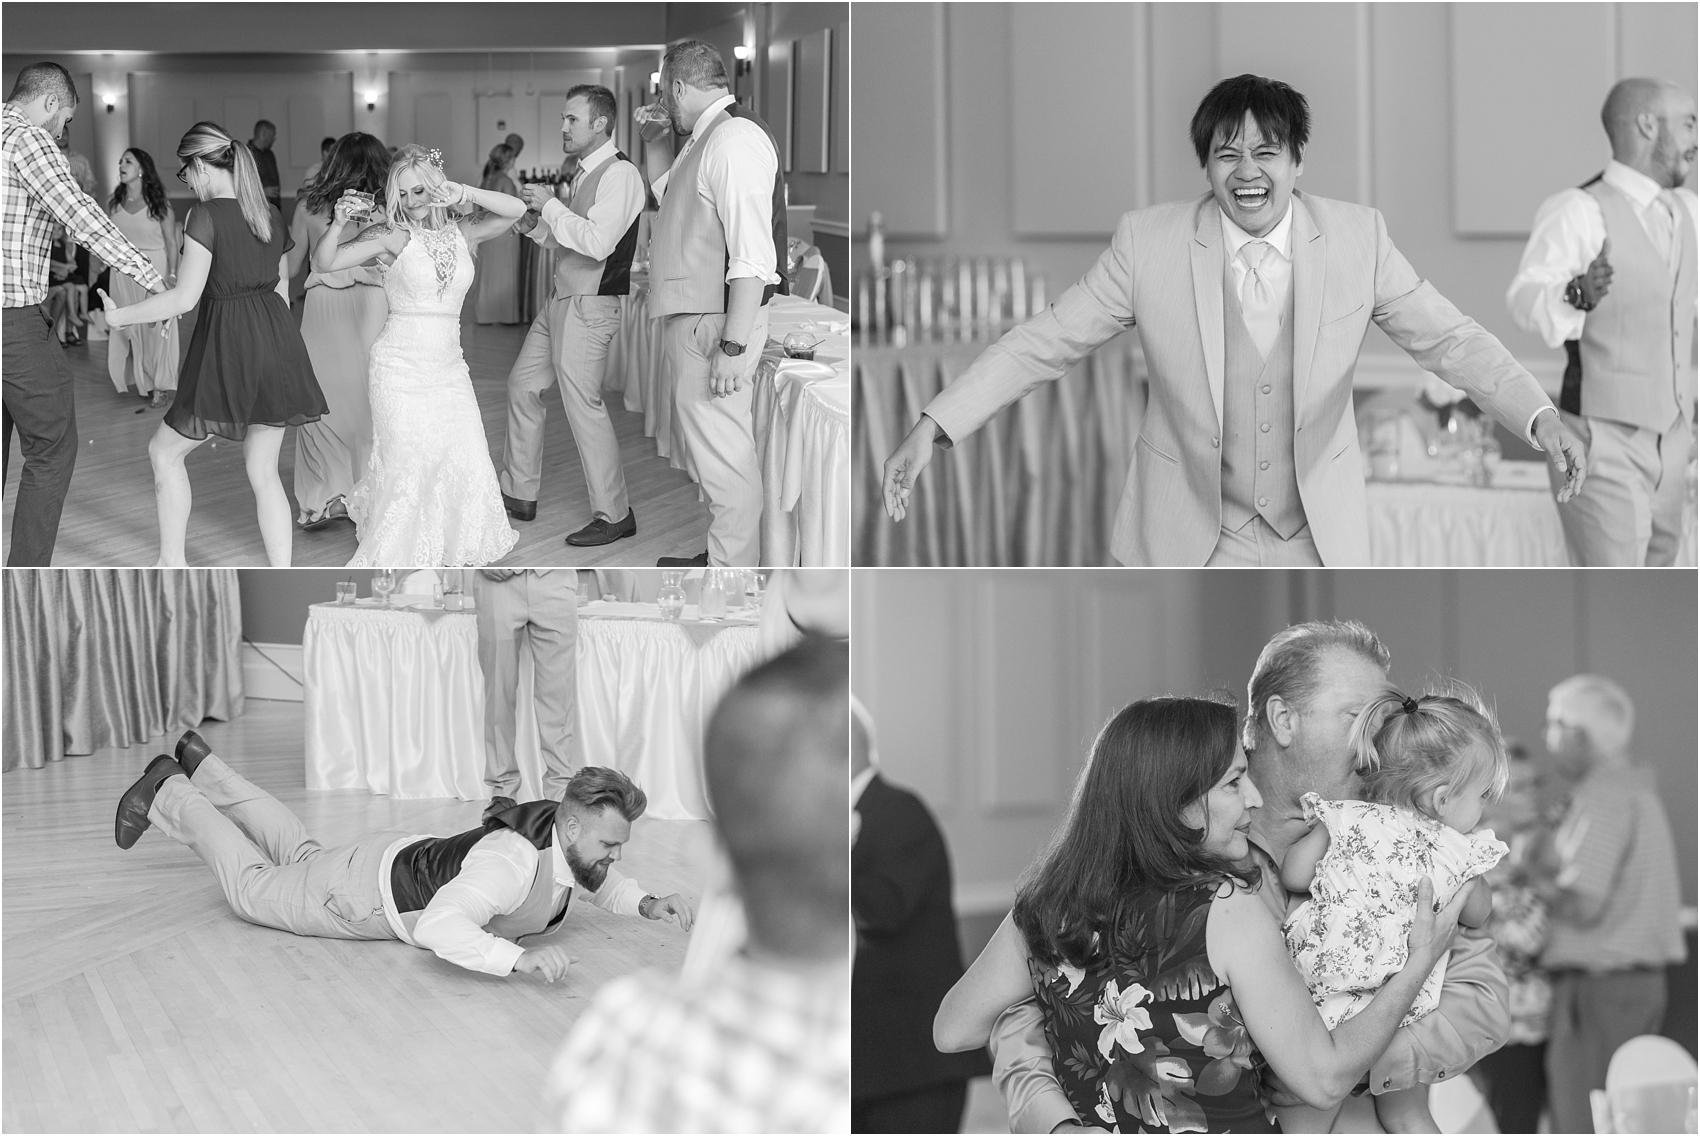 fun-whimsical-beach-wedding-photos-in-st-joseph-michigan-by-courtney-carolyn-photography_0097.jpg